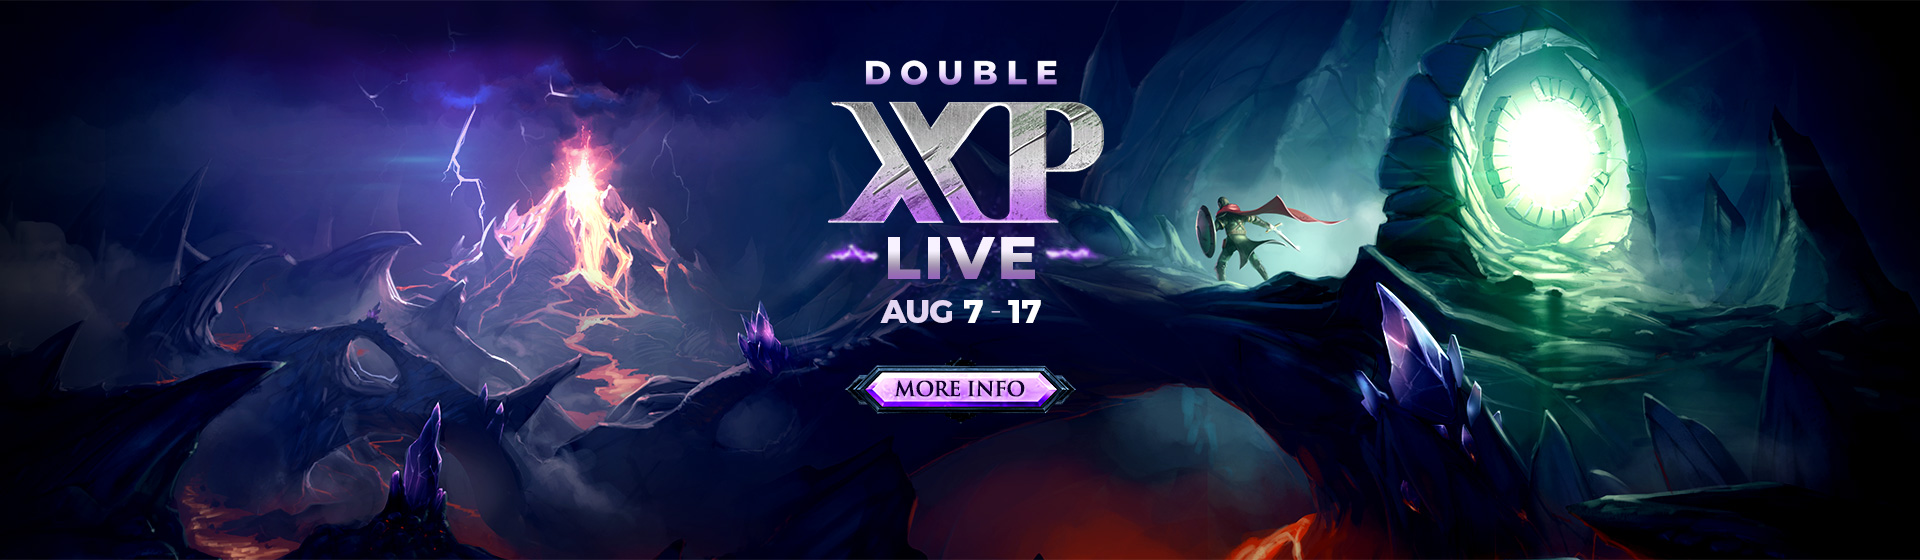 Double XP LIVE - 7 - 17 August